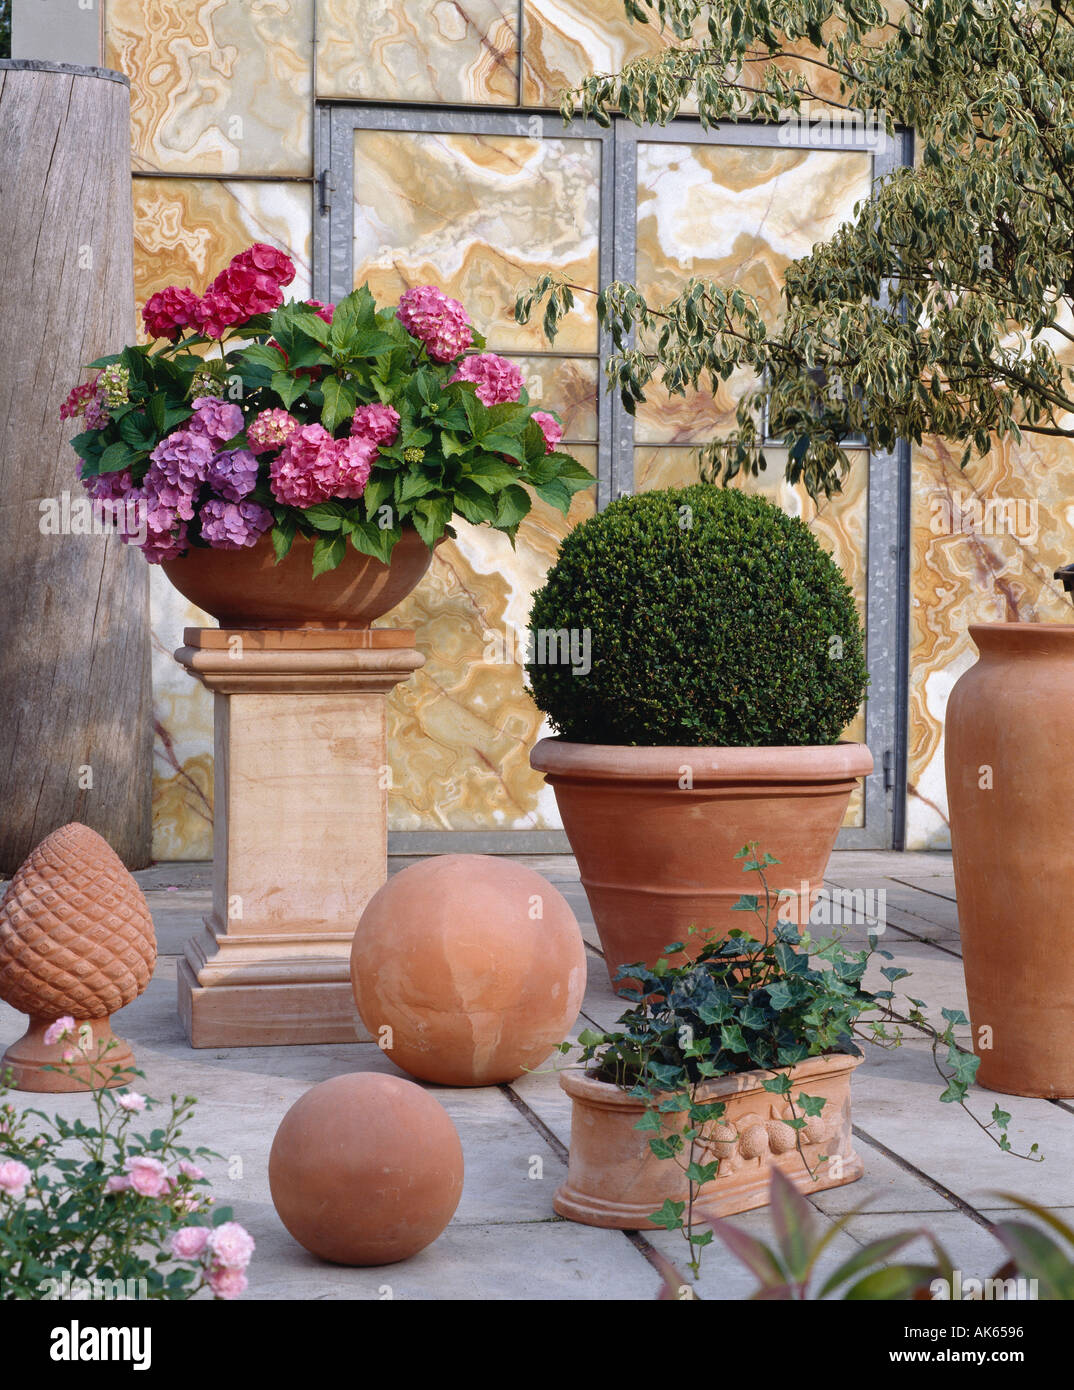 Terracota Vasos De Flores No Terraço Blumentoepfe Aus Terrakotta Auf  Terrasse Pflanzen Hochformat Blumentopf Plantas Vertical Garten Foto,  Imagem De Stock: ...